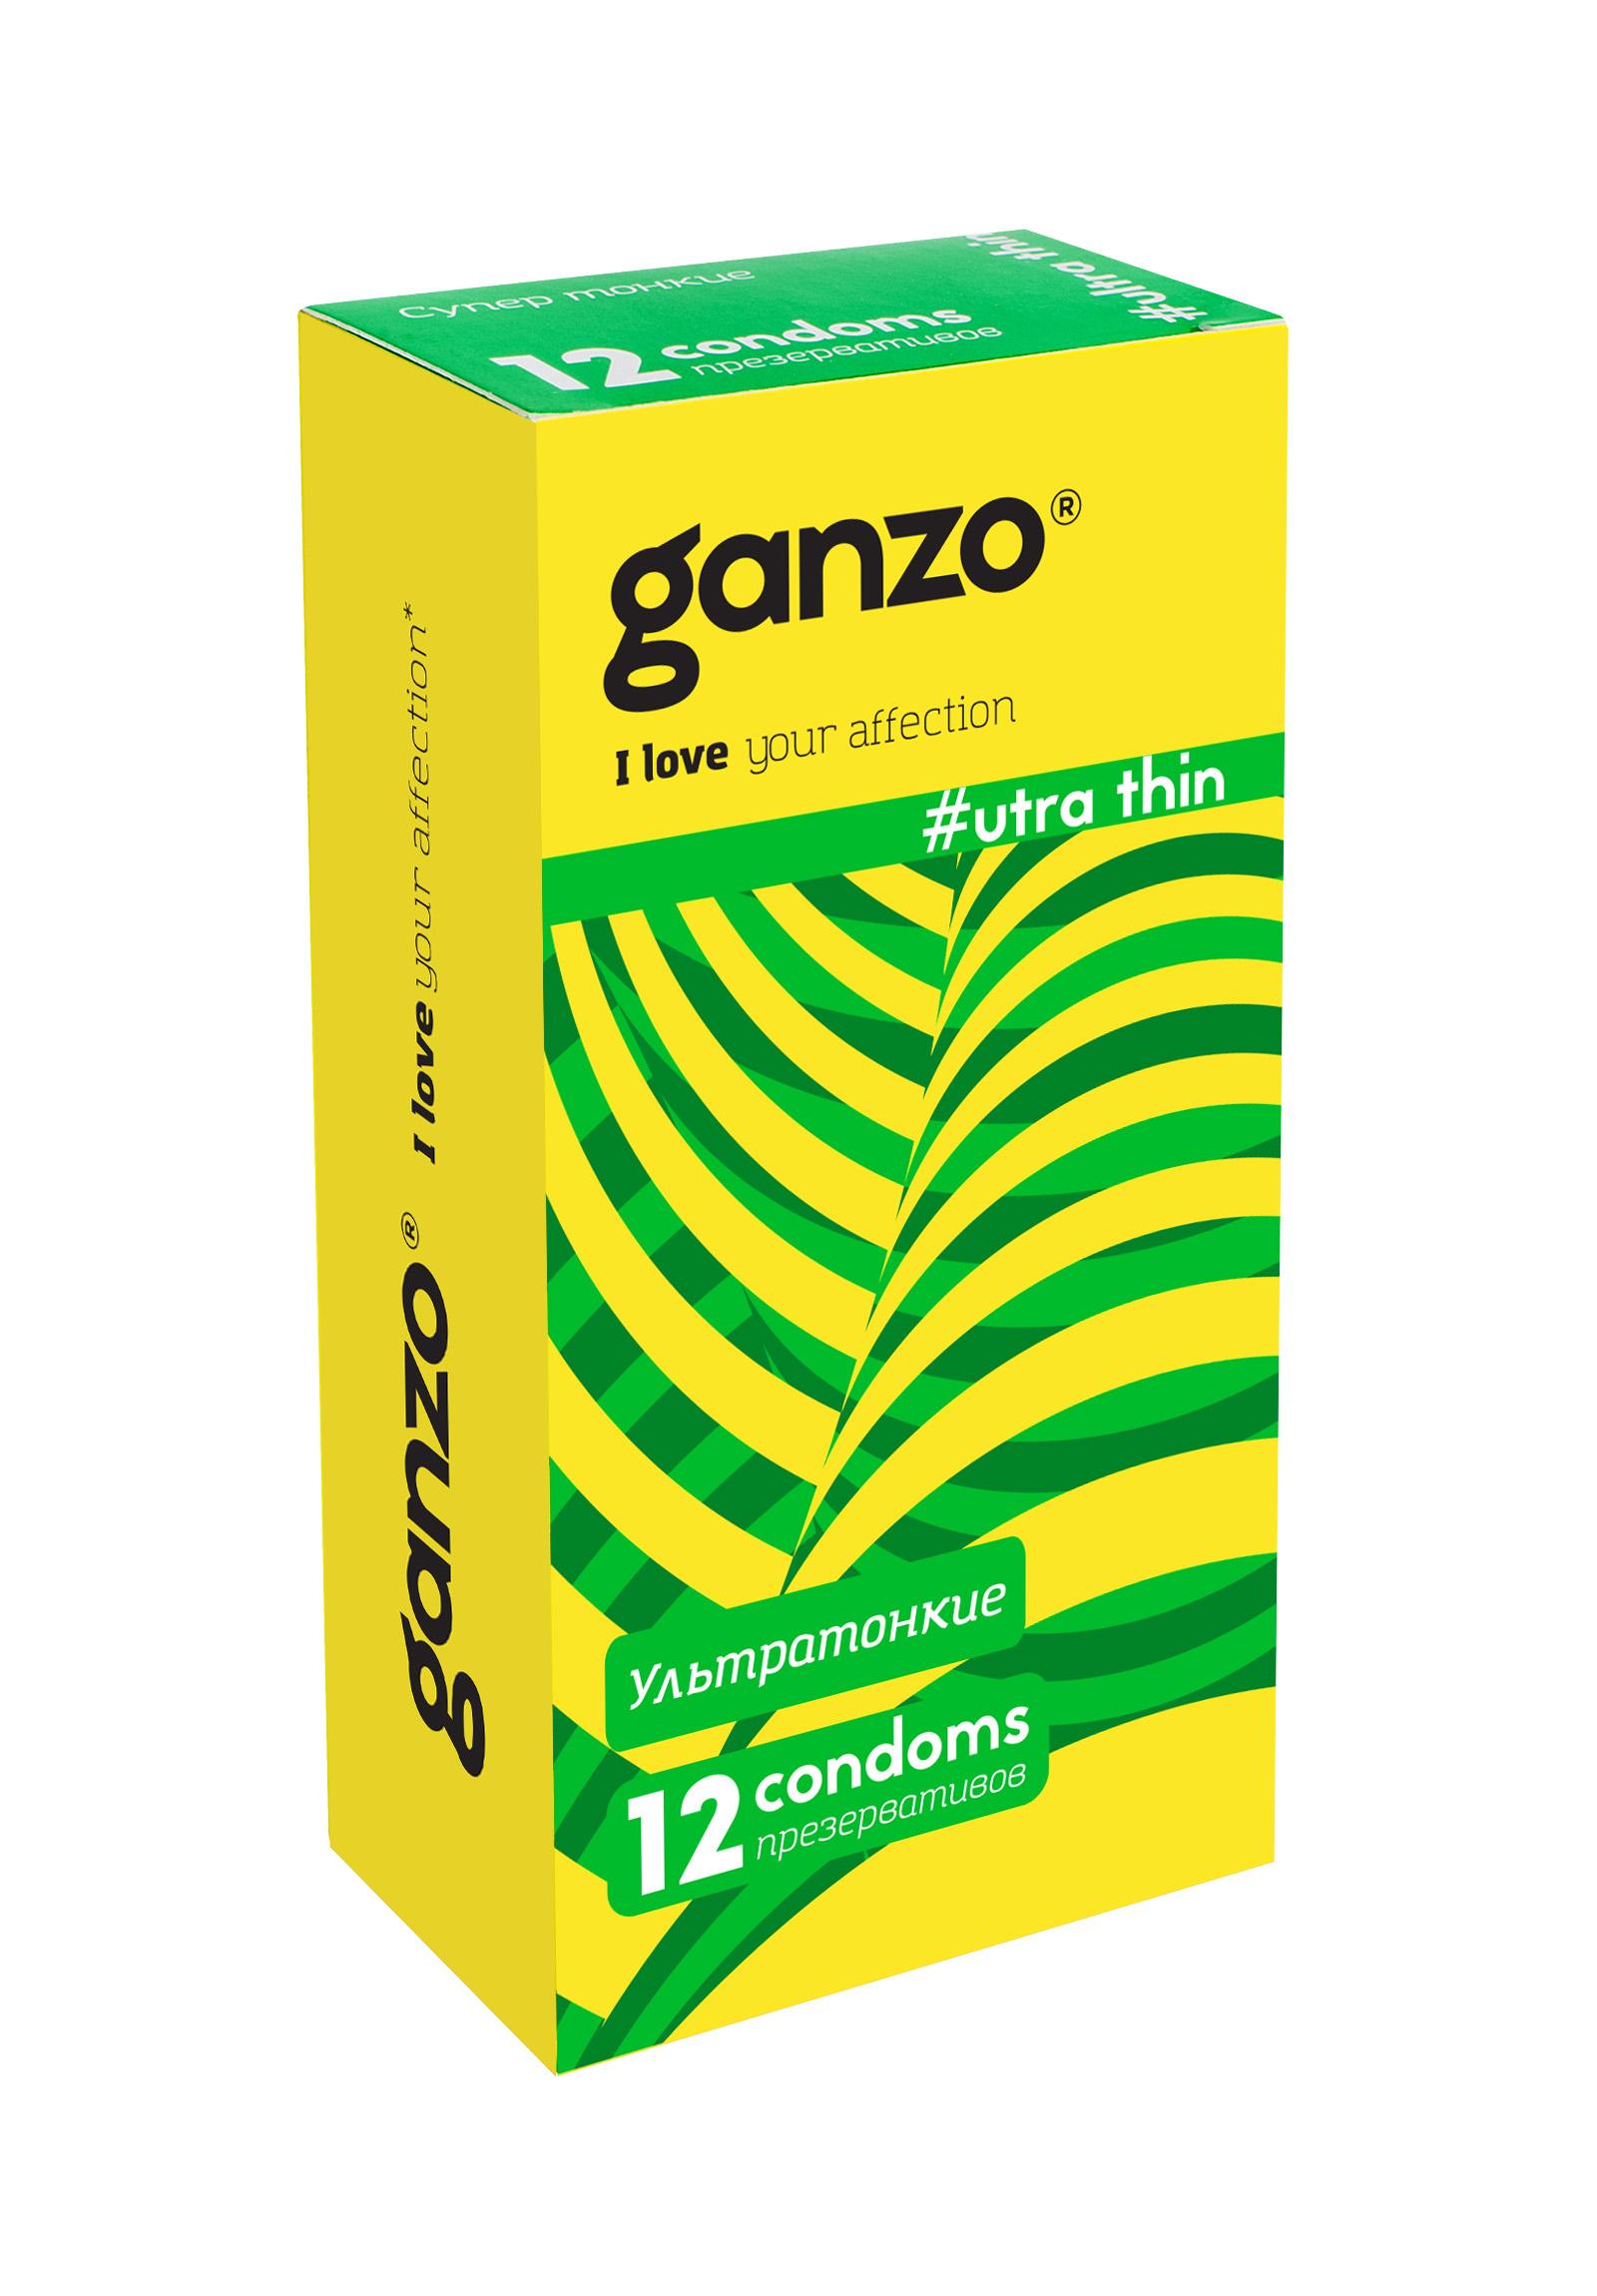 Ганзо презервативы №12 ультра